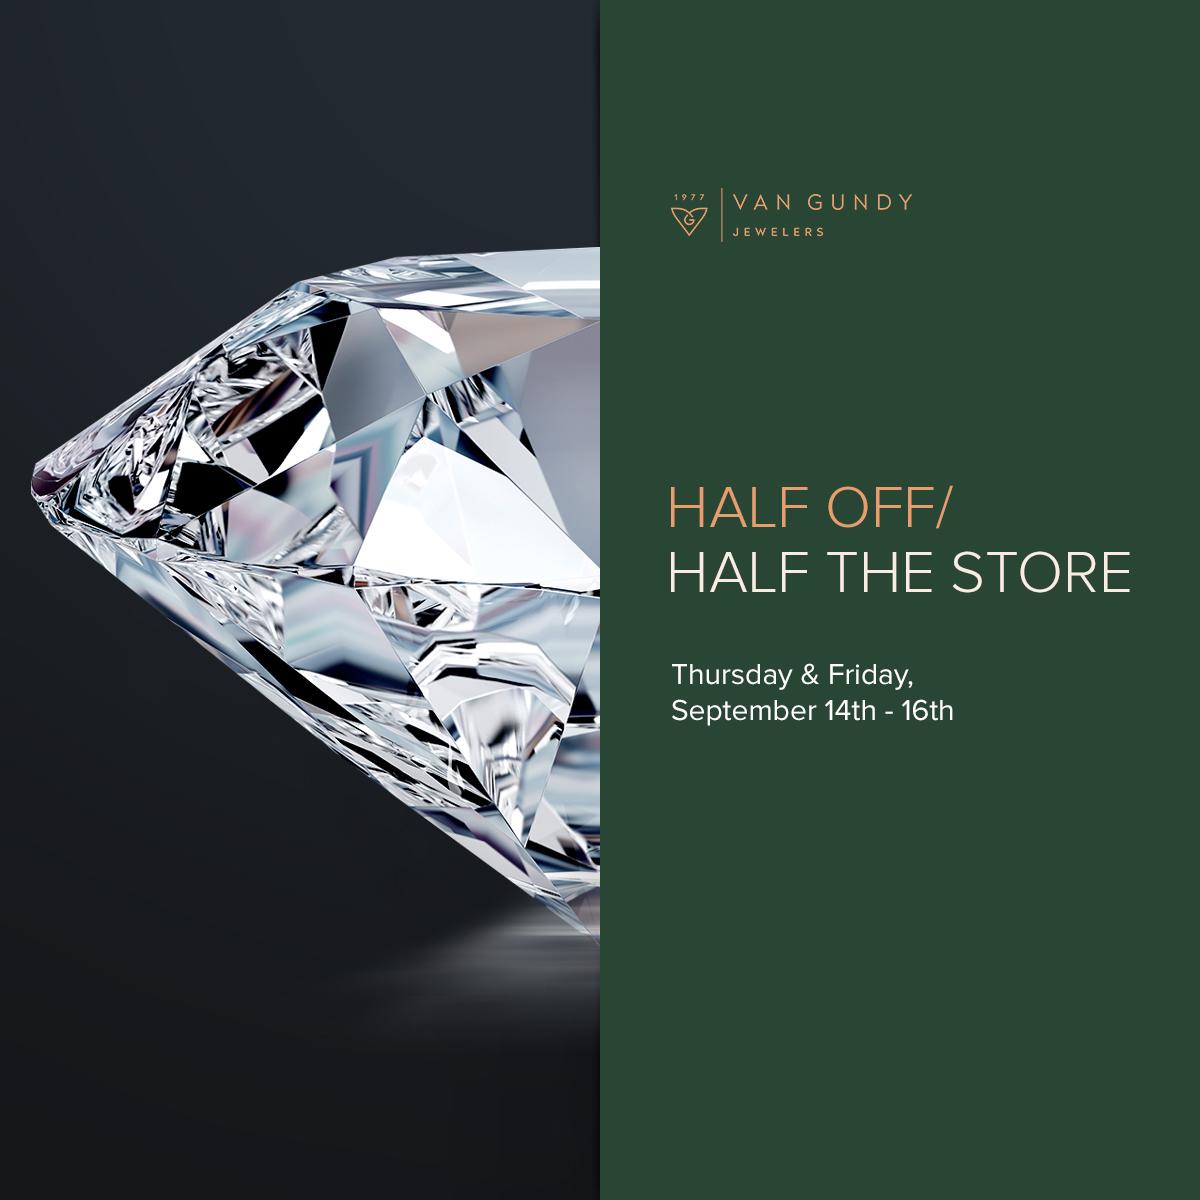 HALF OFF / HALF THE STORE SALE